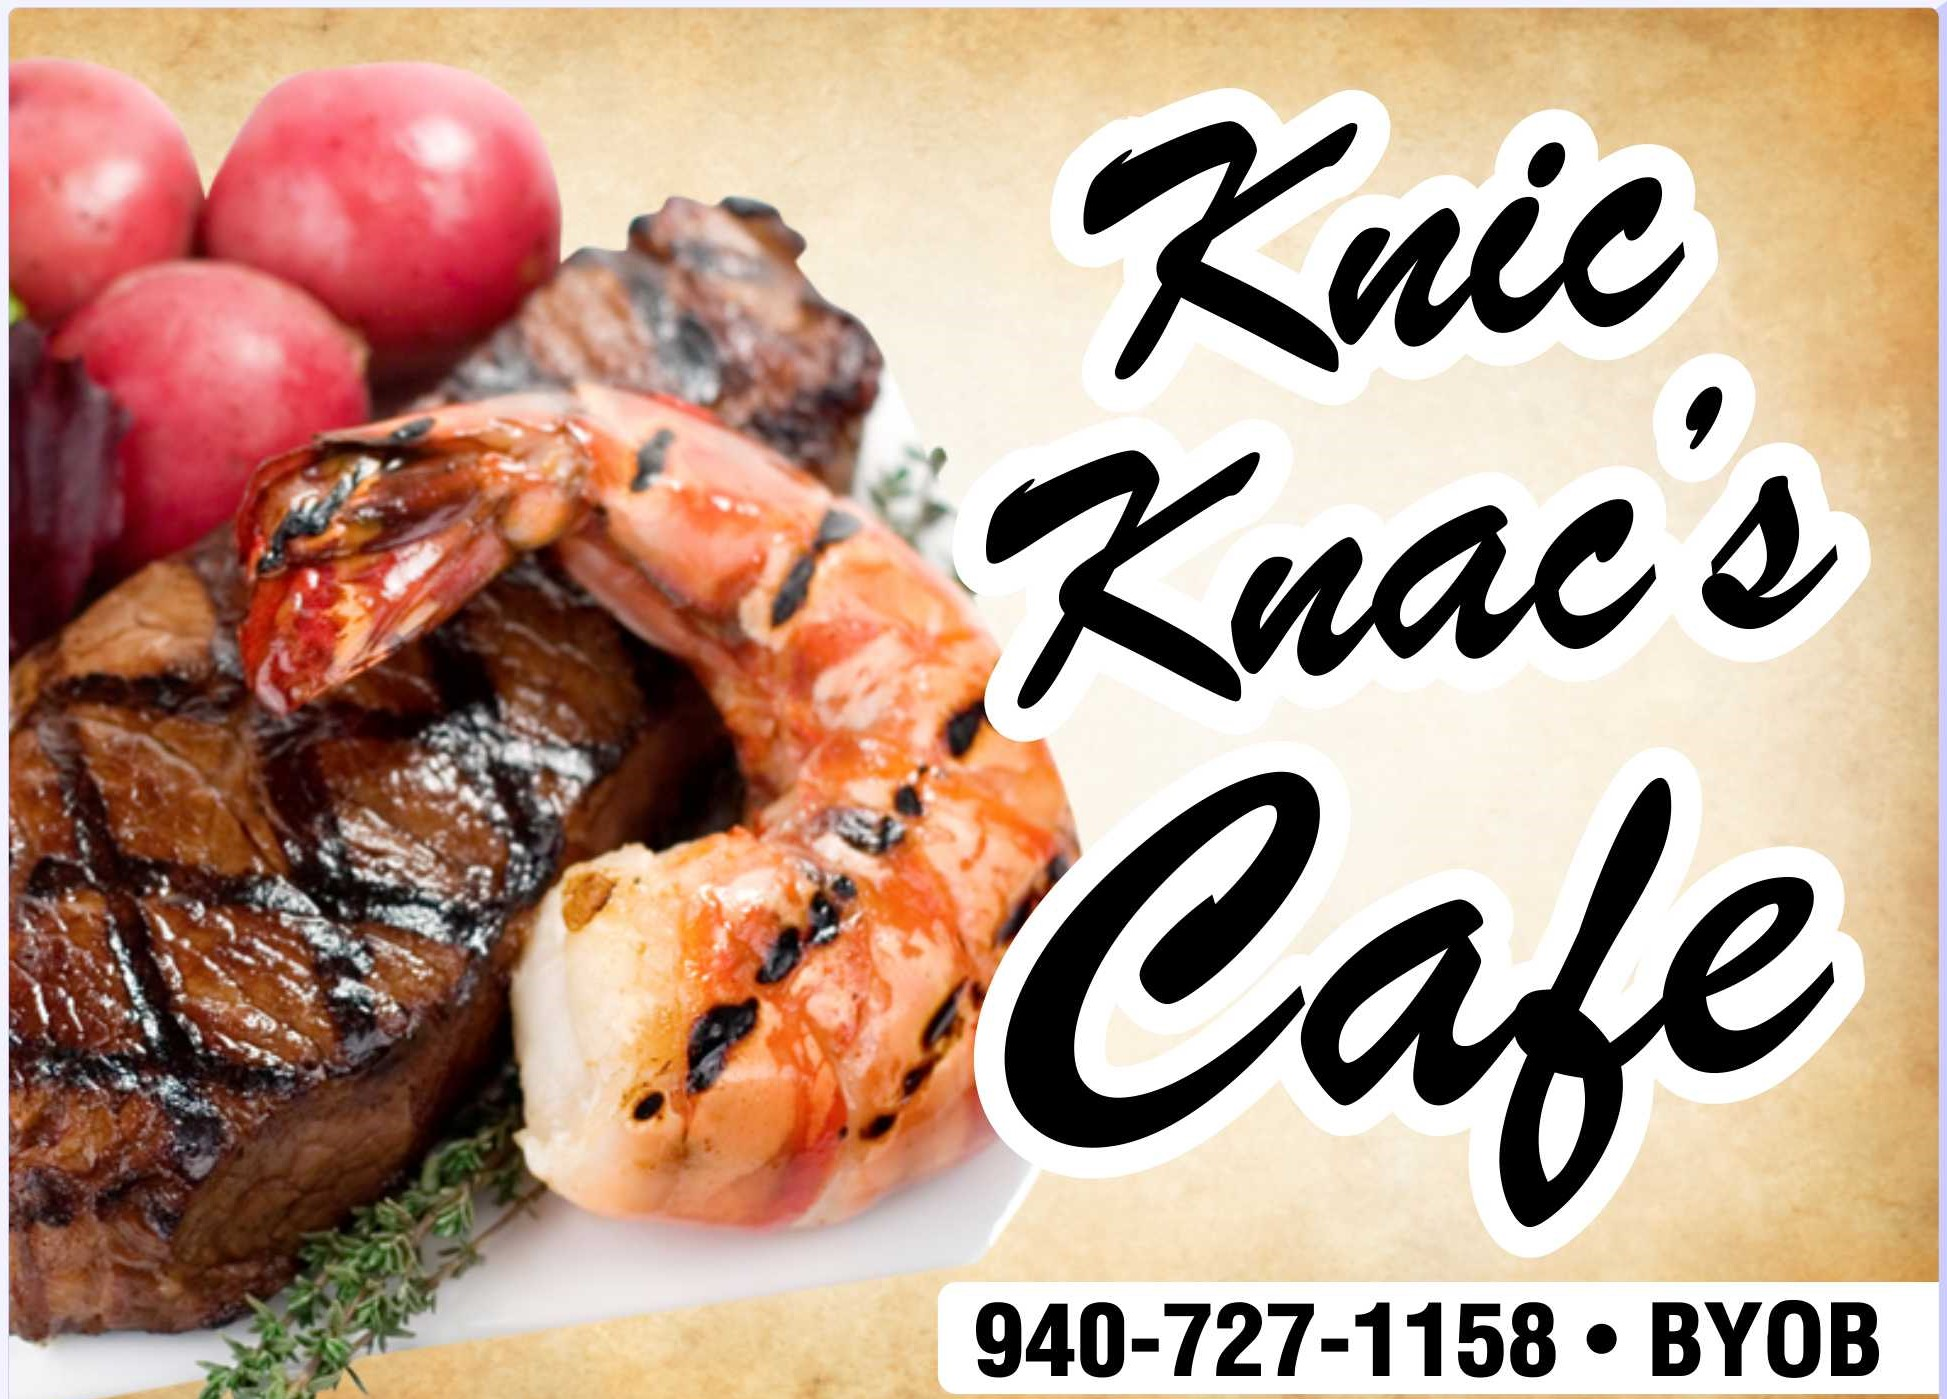 Knic Knacs Cafe Home